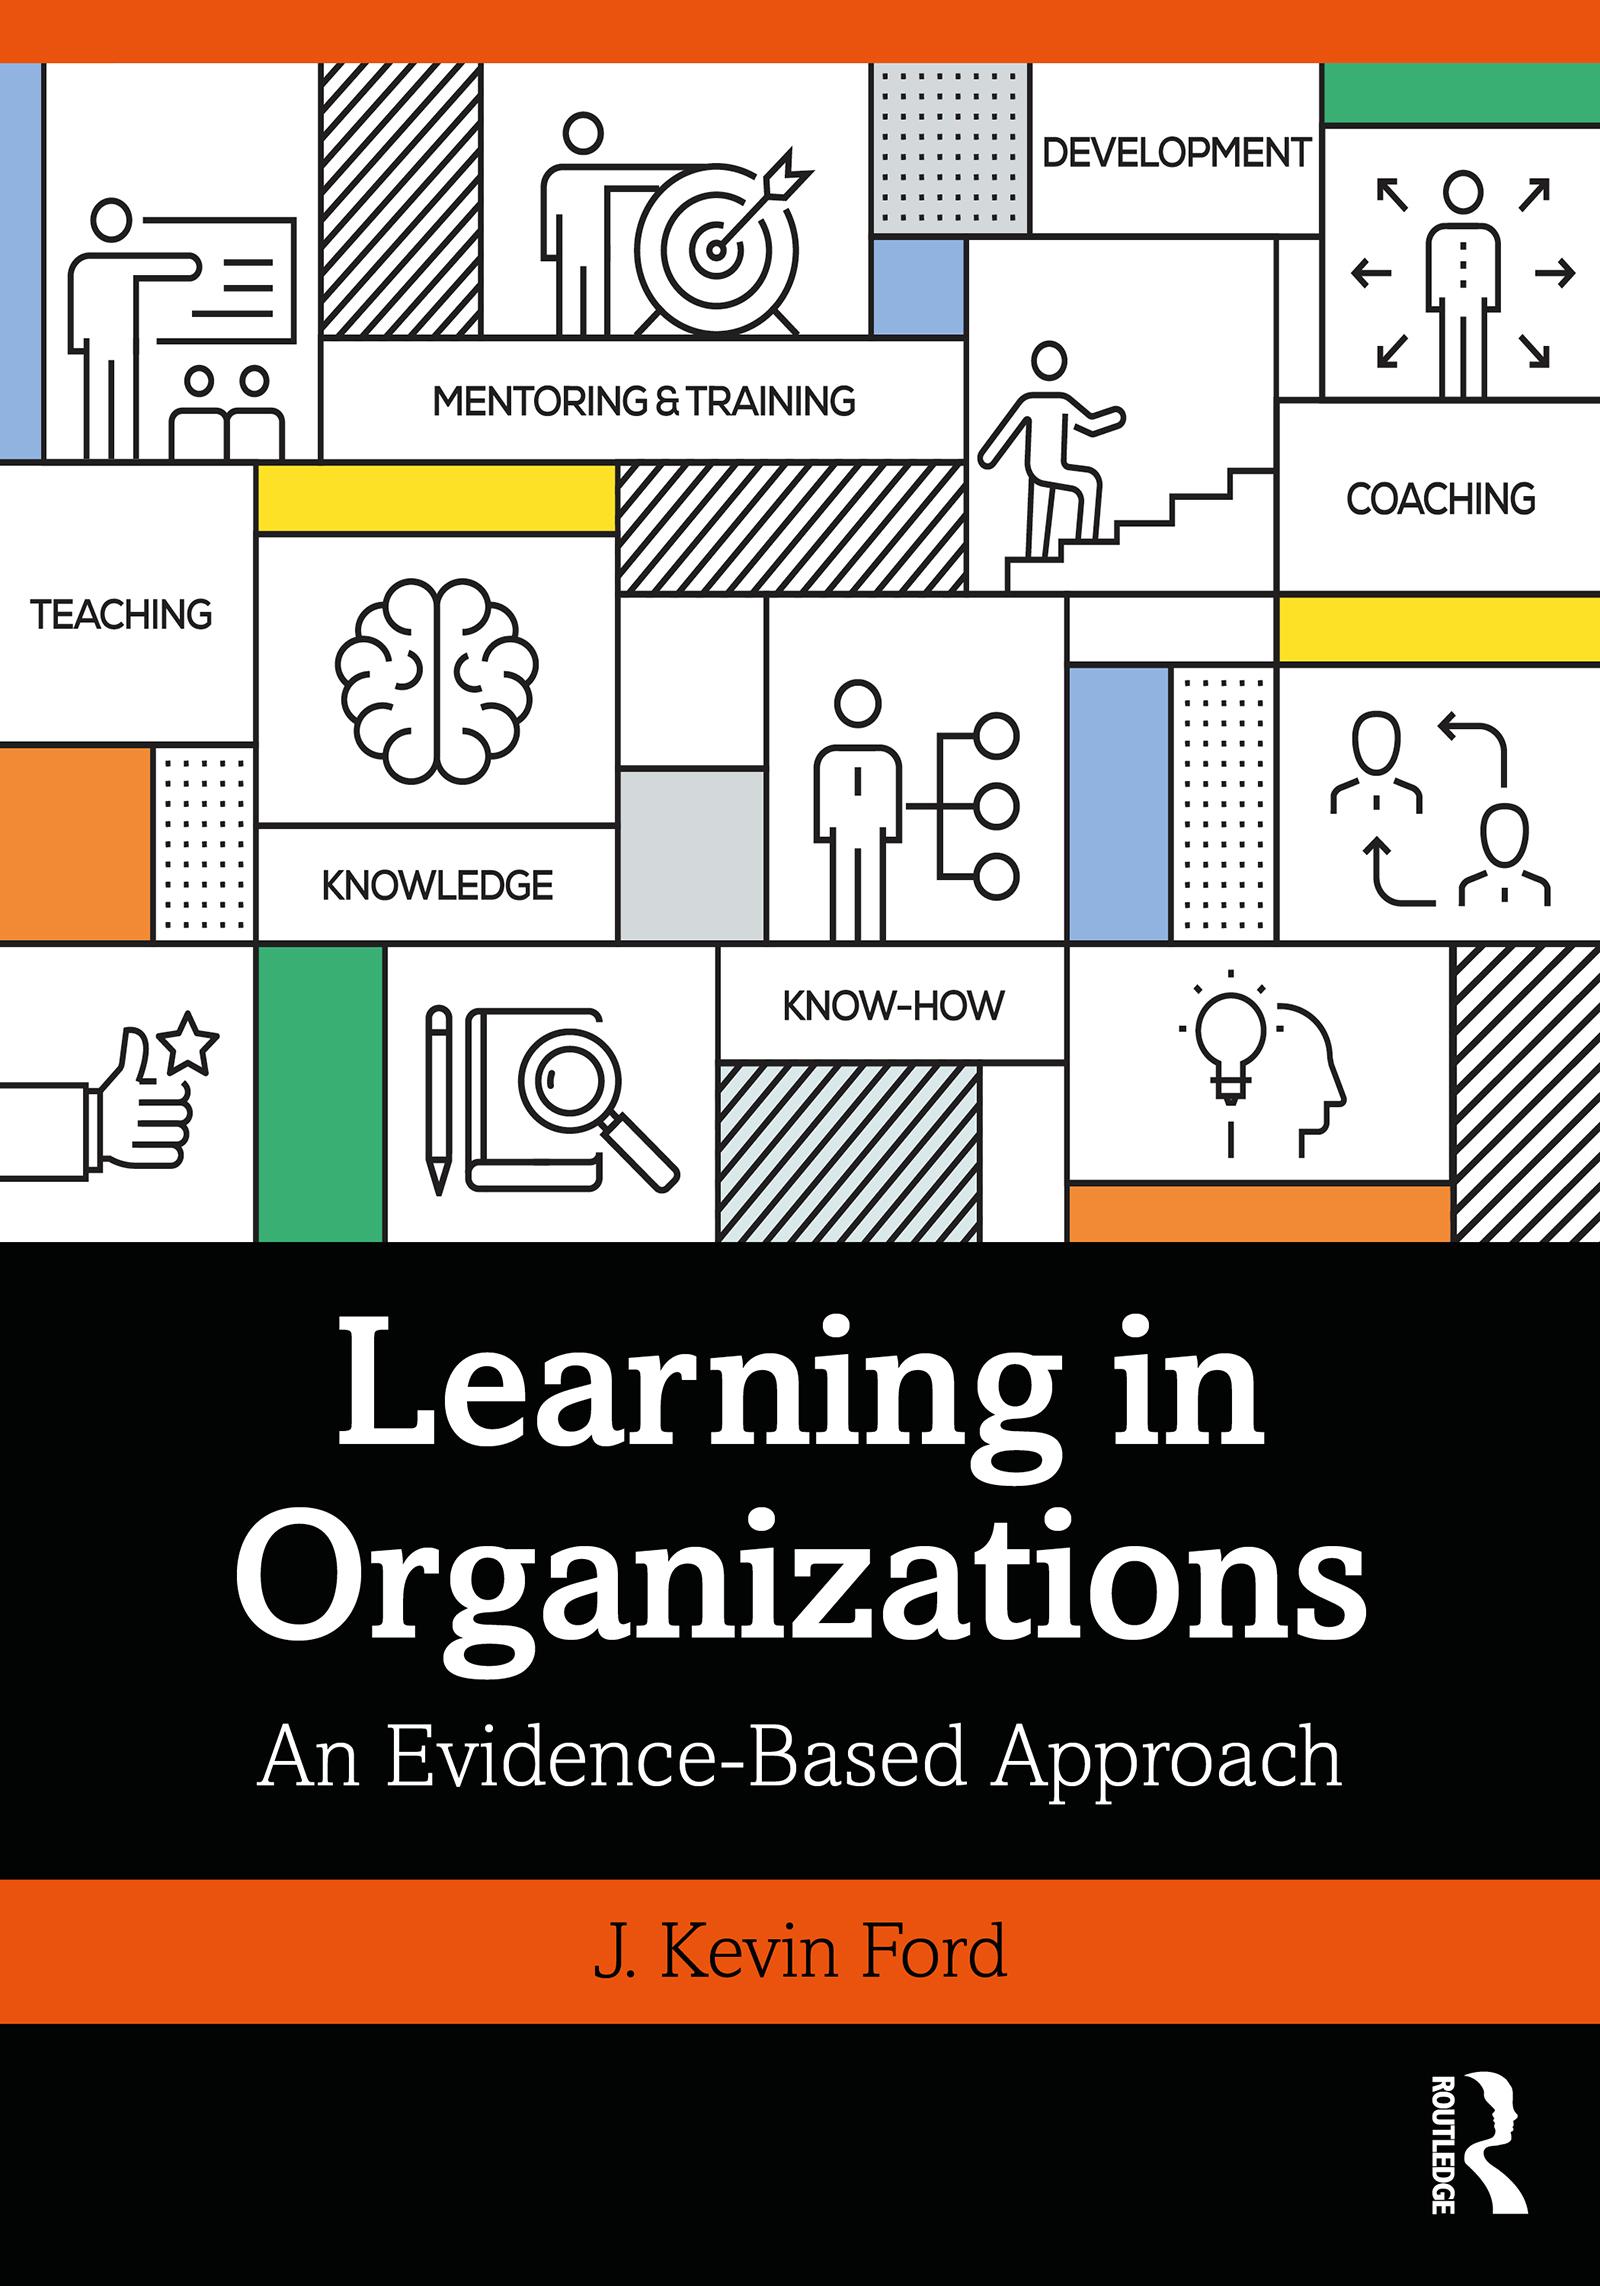 Learning in Organizations